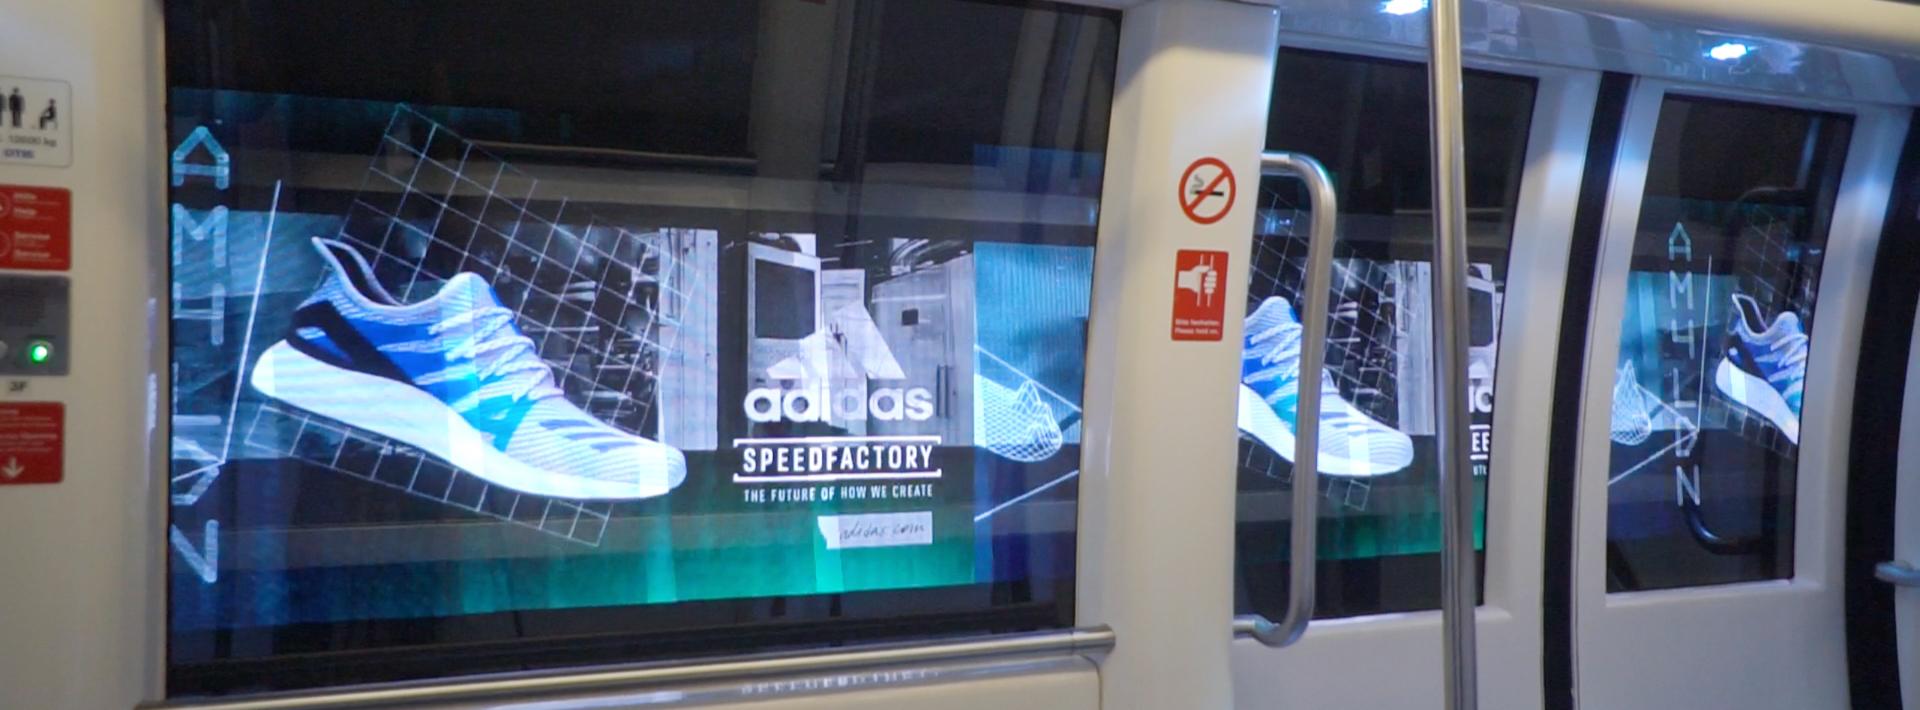 Digitale tunnelreclame in Rotterdamse metro